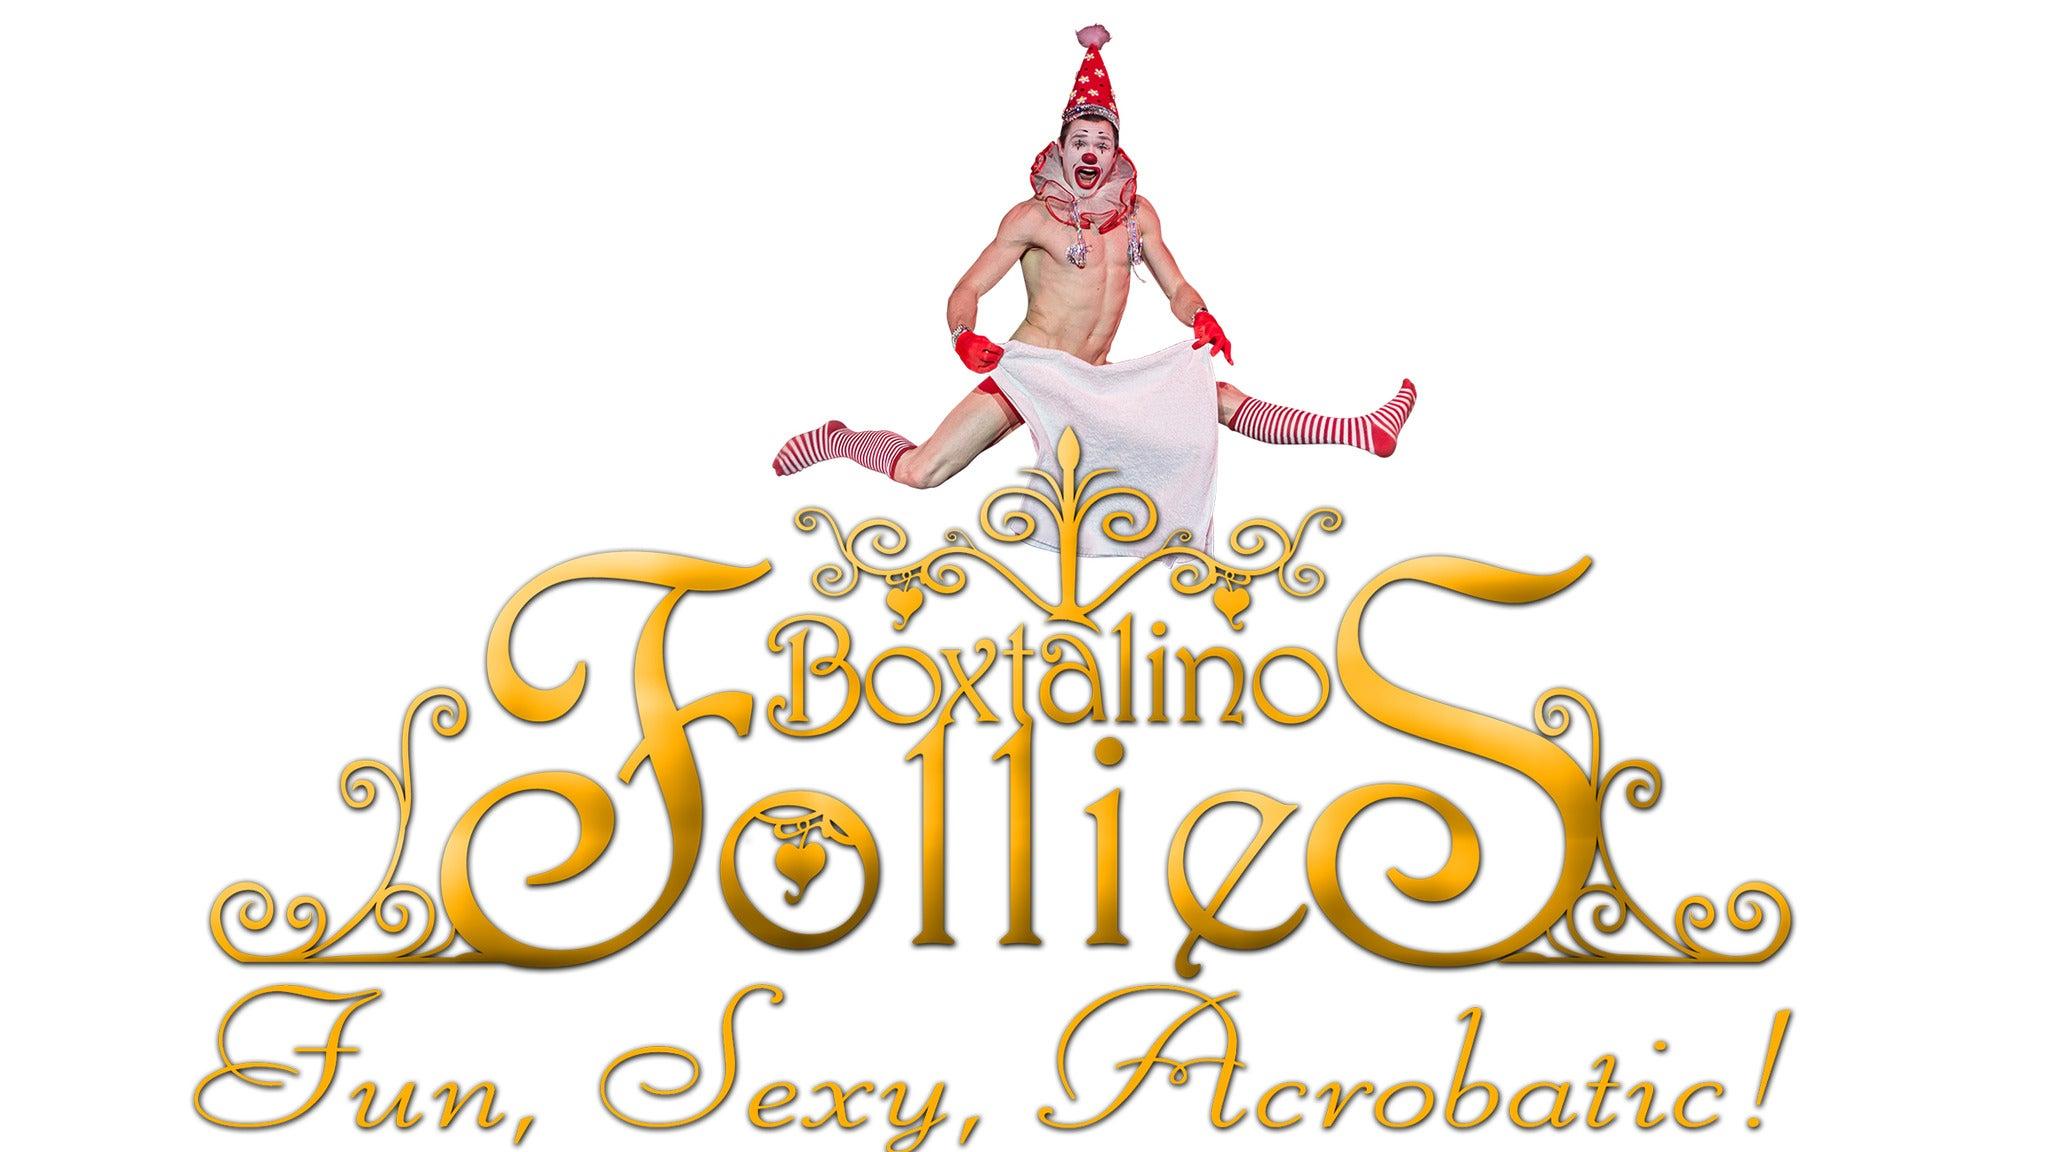 Boxtalino Follies